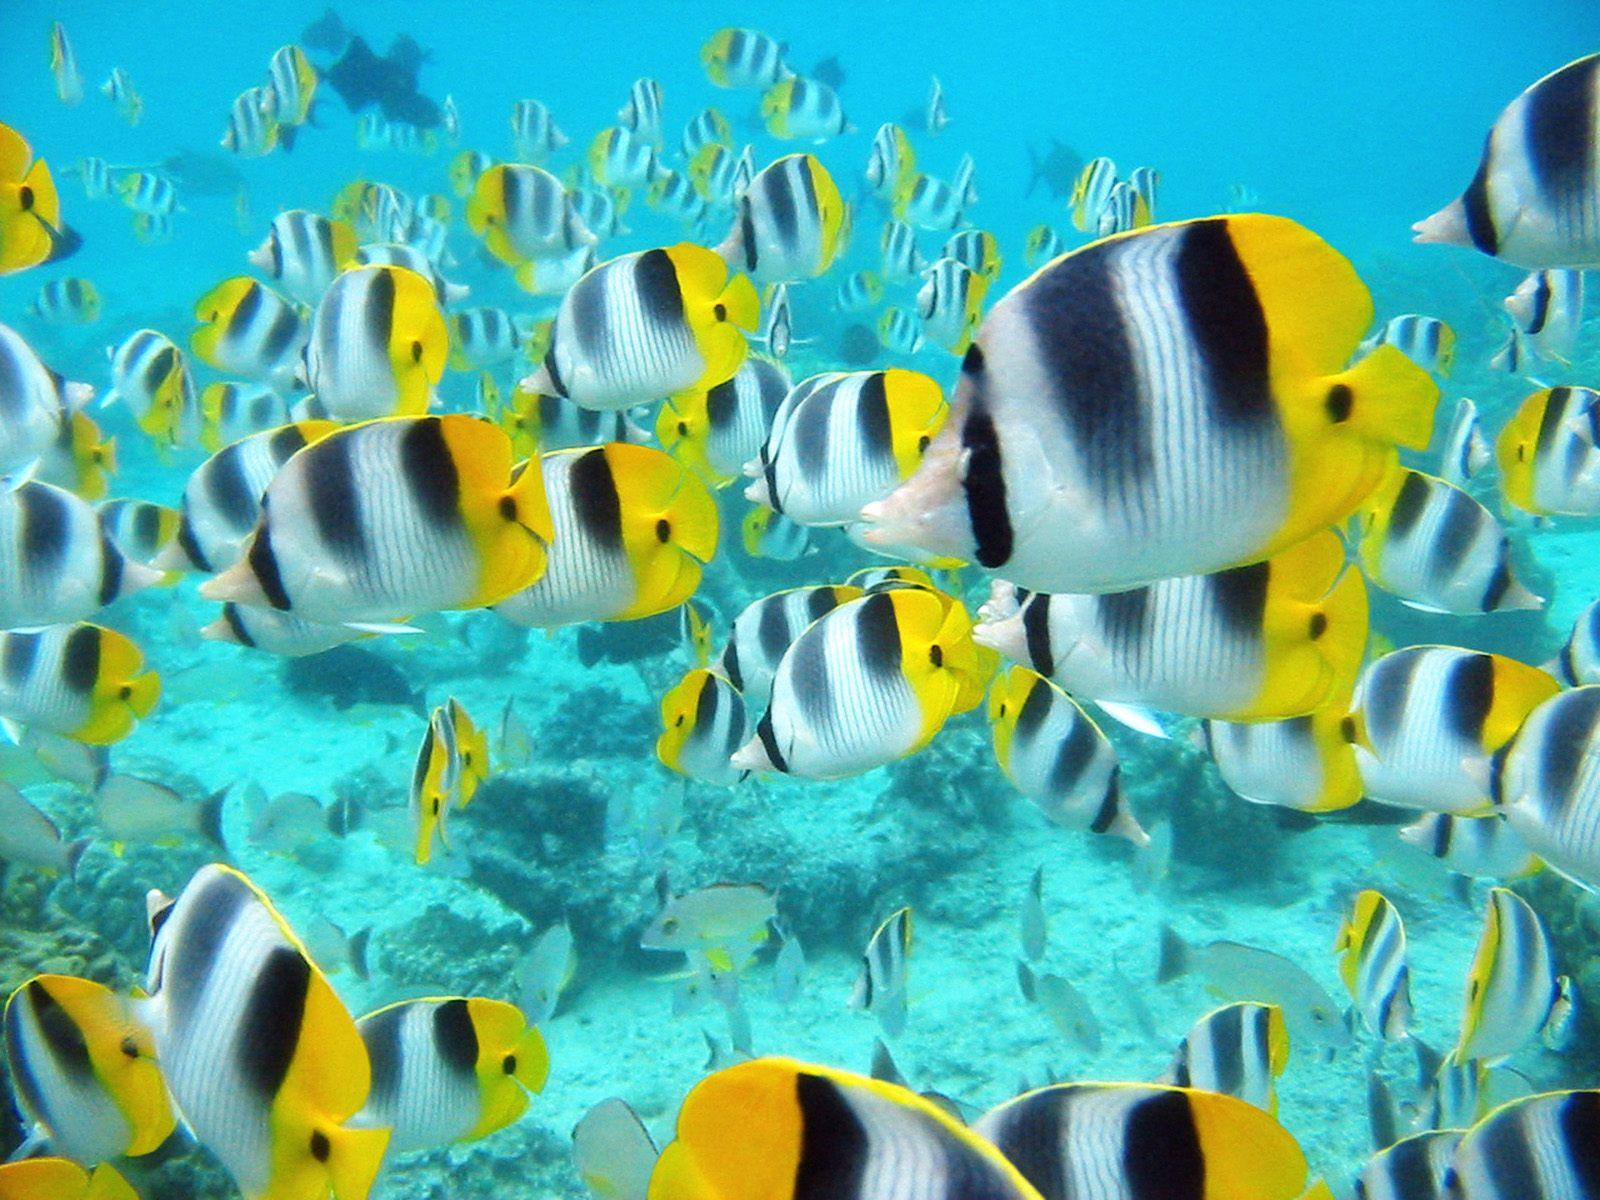 tropical fish screensaver tropical fish screensaver tropical fish pic ...